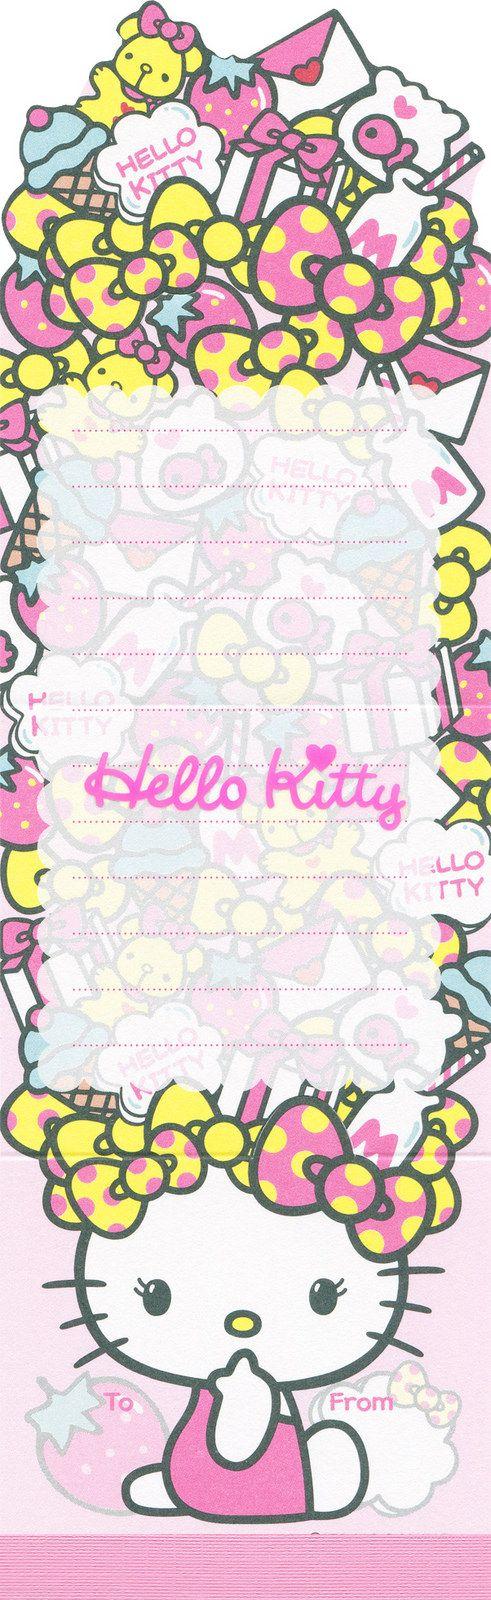 "https://flic.kr/p/Ardtz1 | Sanrio Hello Kitty ""Favourites"" Die Cut Memo"